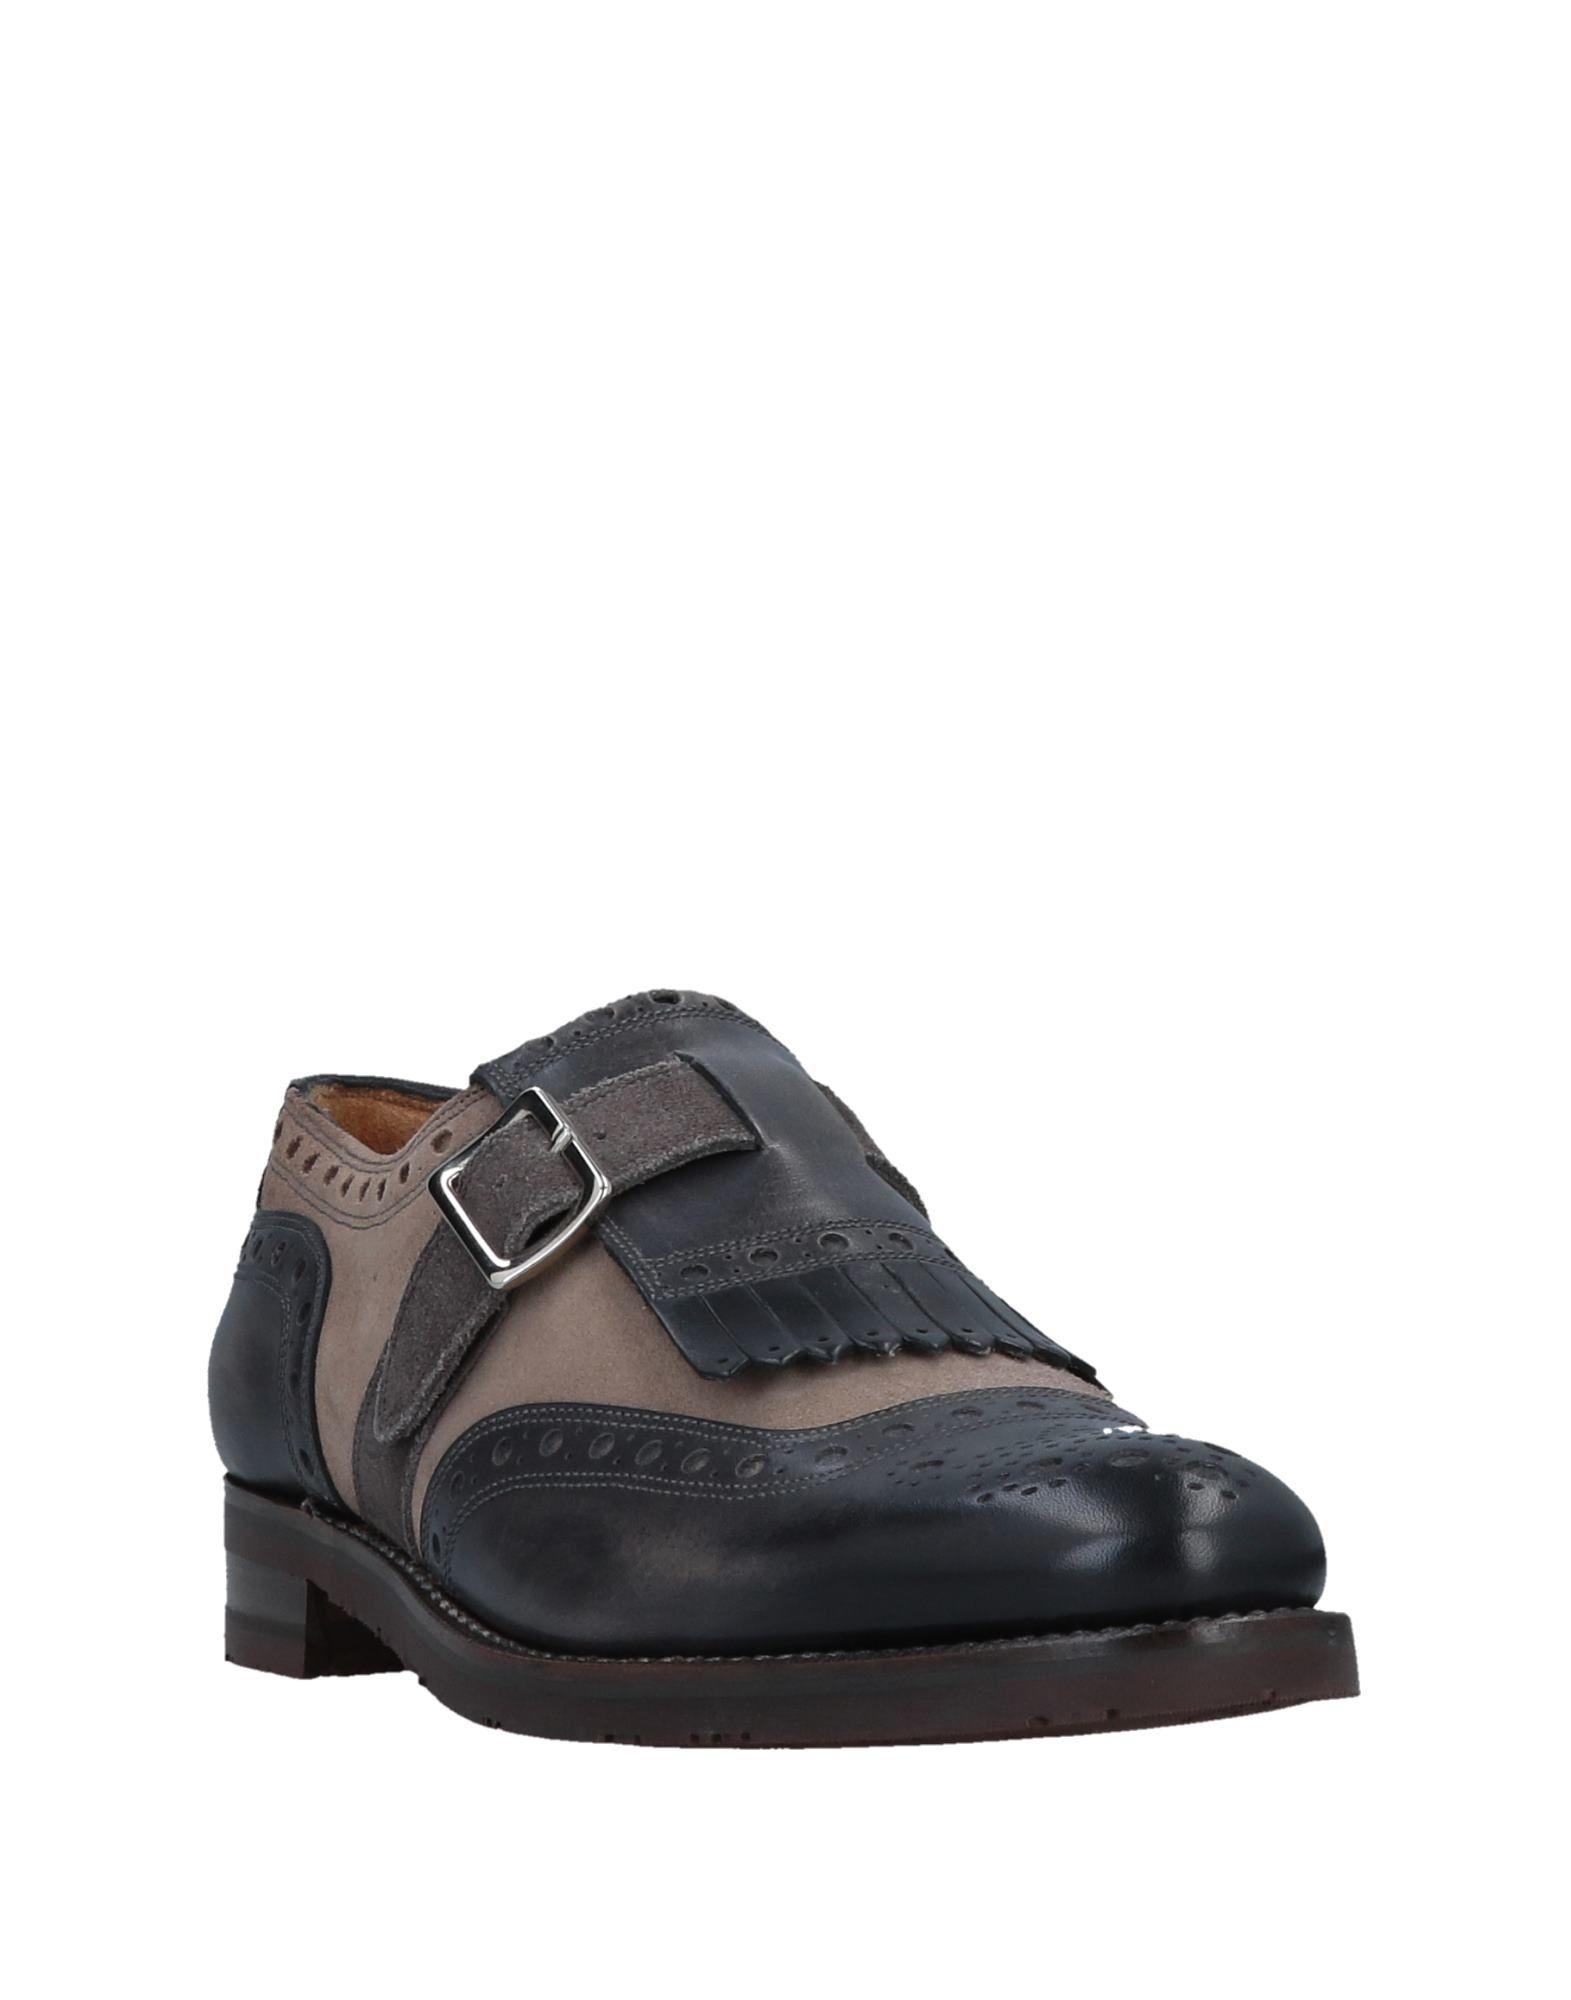 Rabatt echte Schuhe Botti Mokassins 11502242JW Herren  11502242JW Mokassins f3d893